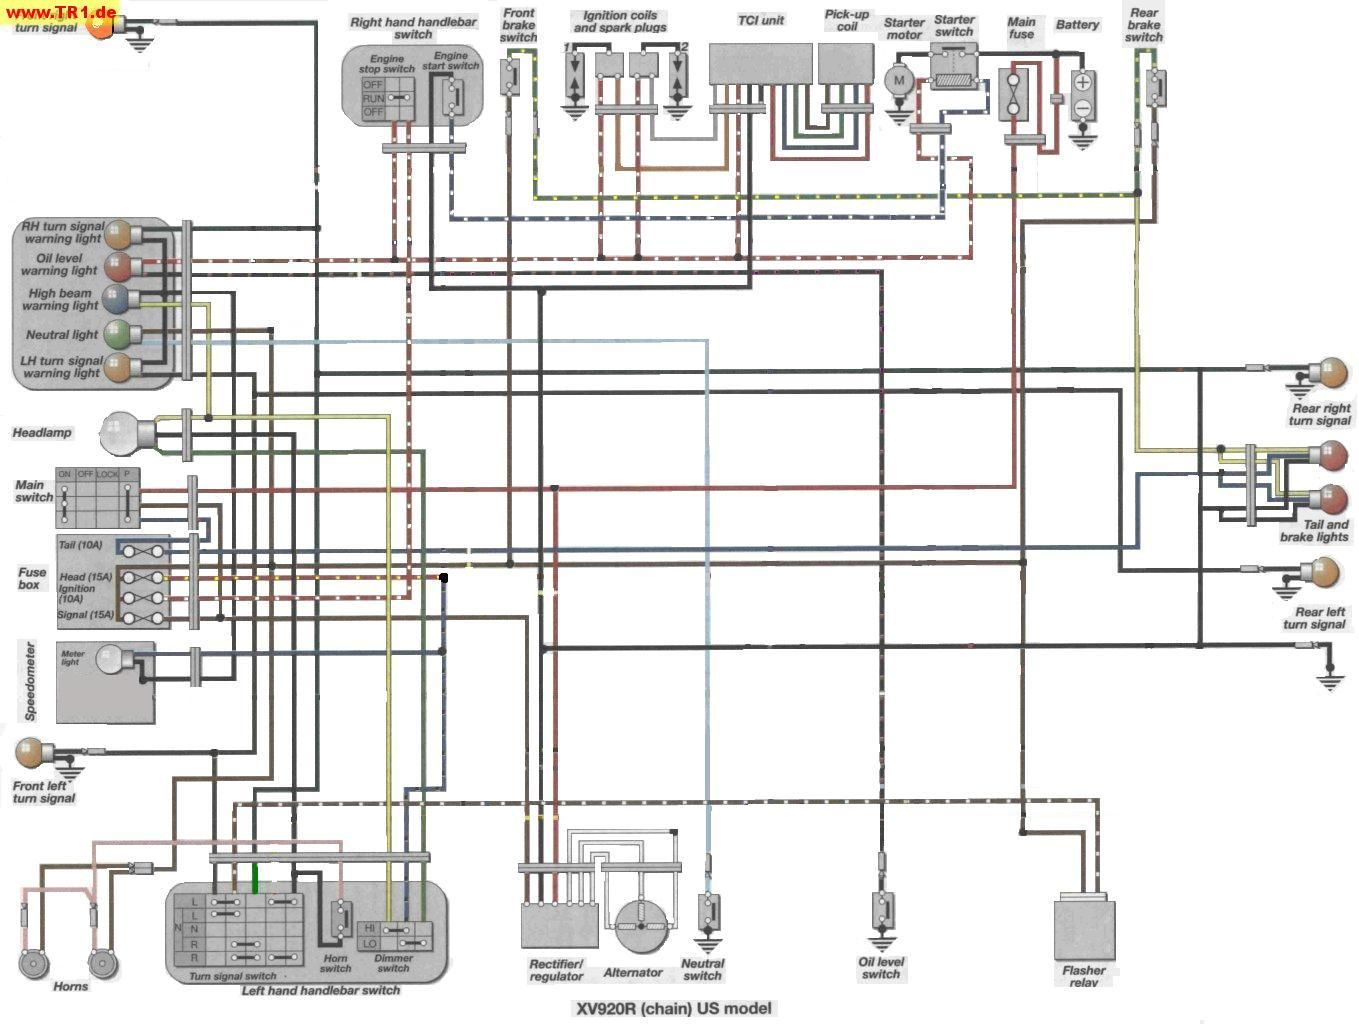 medium resolution of xv920 wiring diagram wiring diagram weektr1 xv1000 xv920 wiring diagrams manfred u0027s tr1 page all